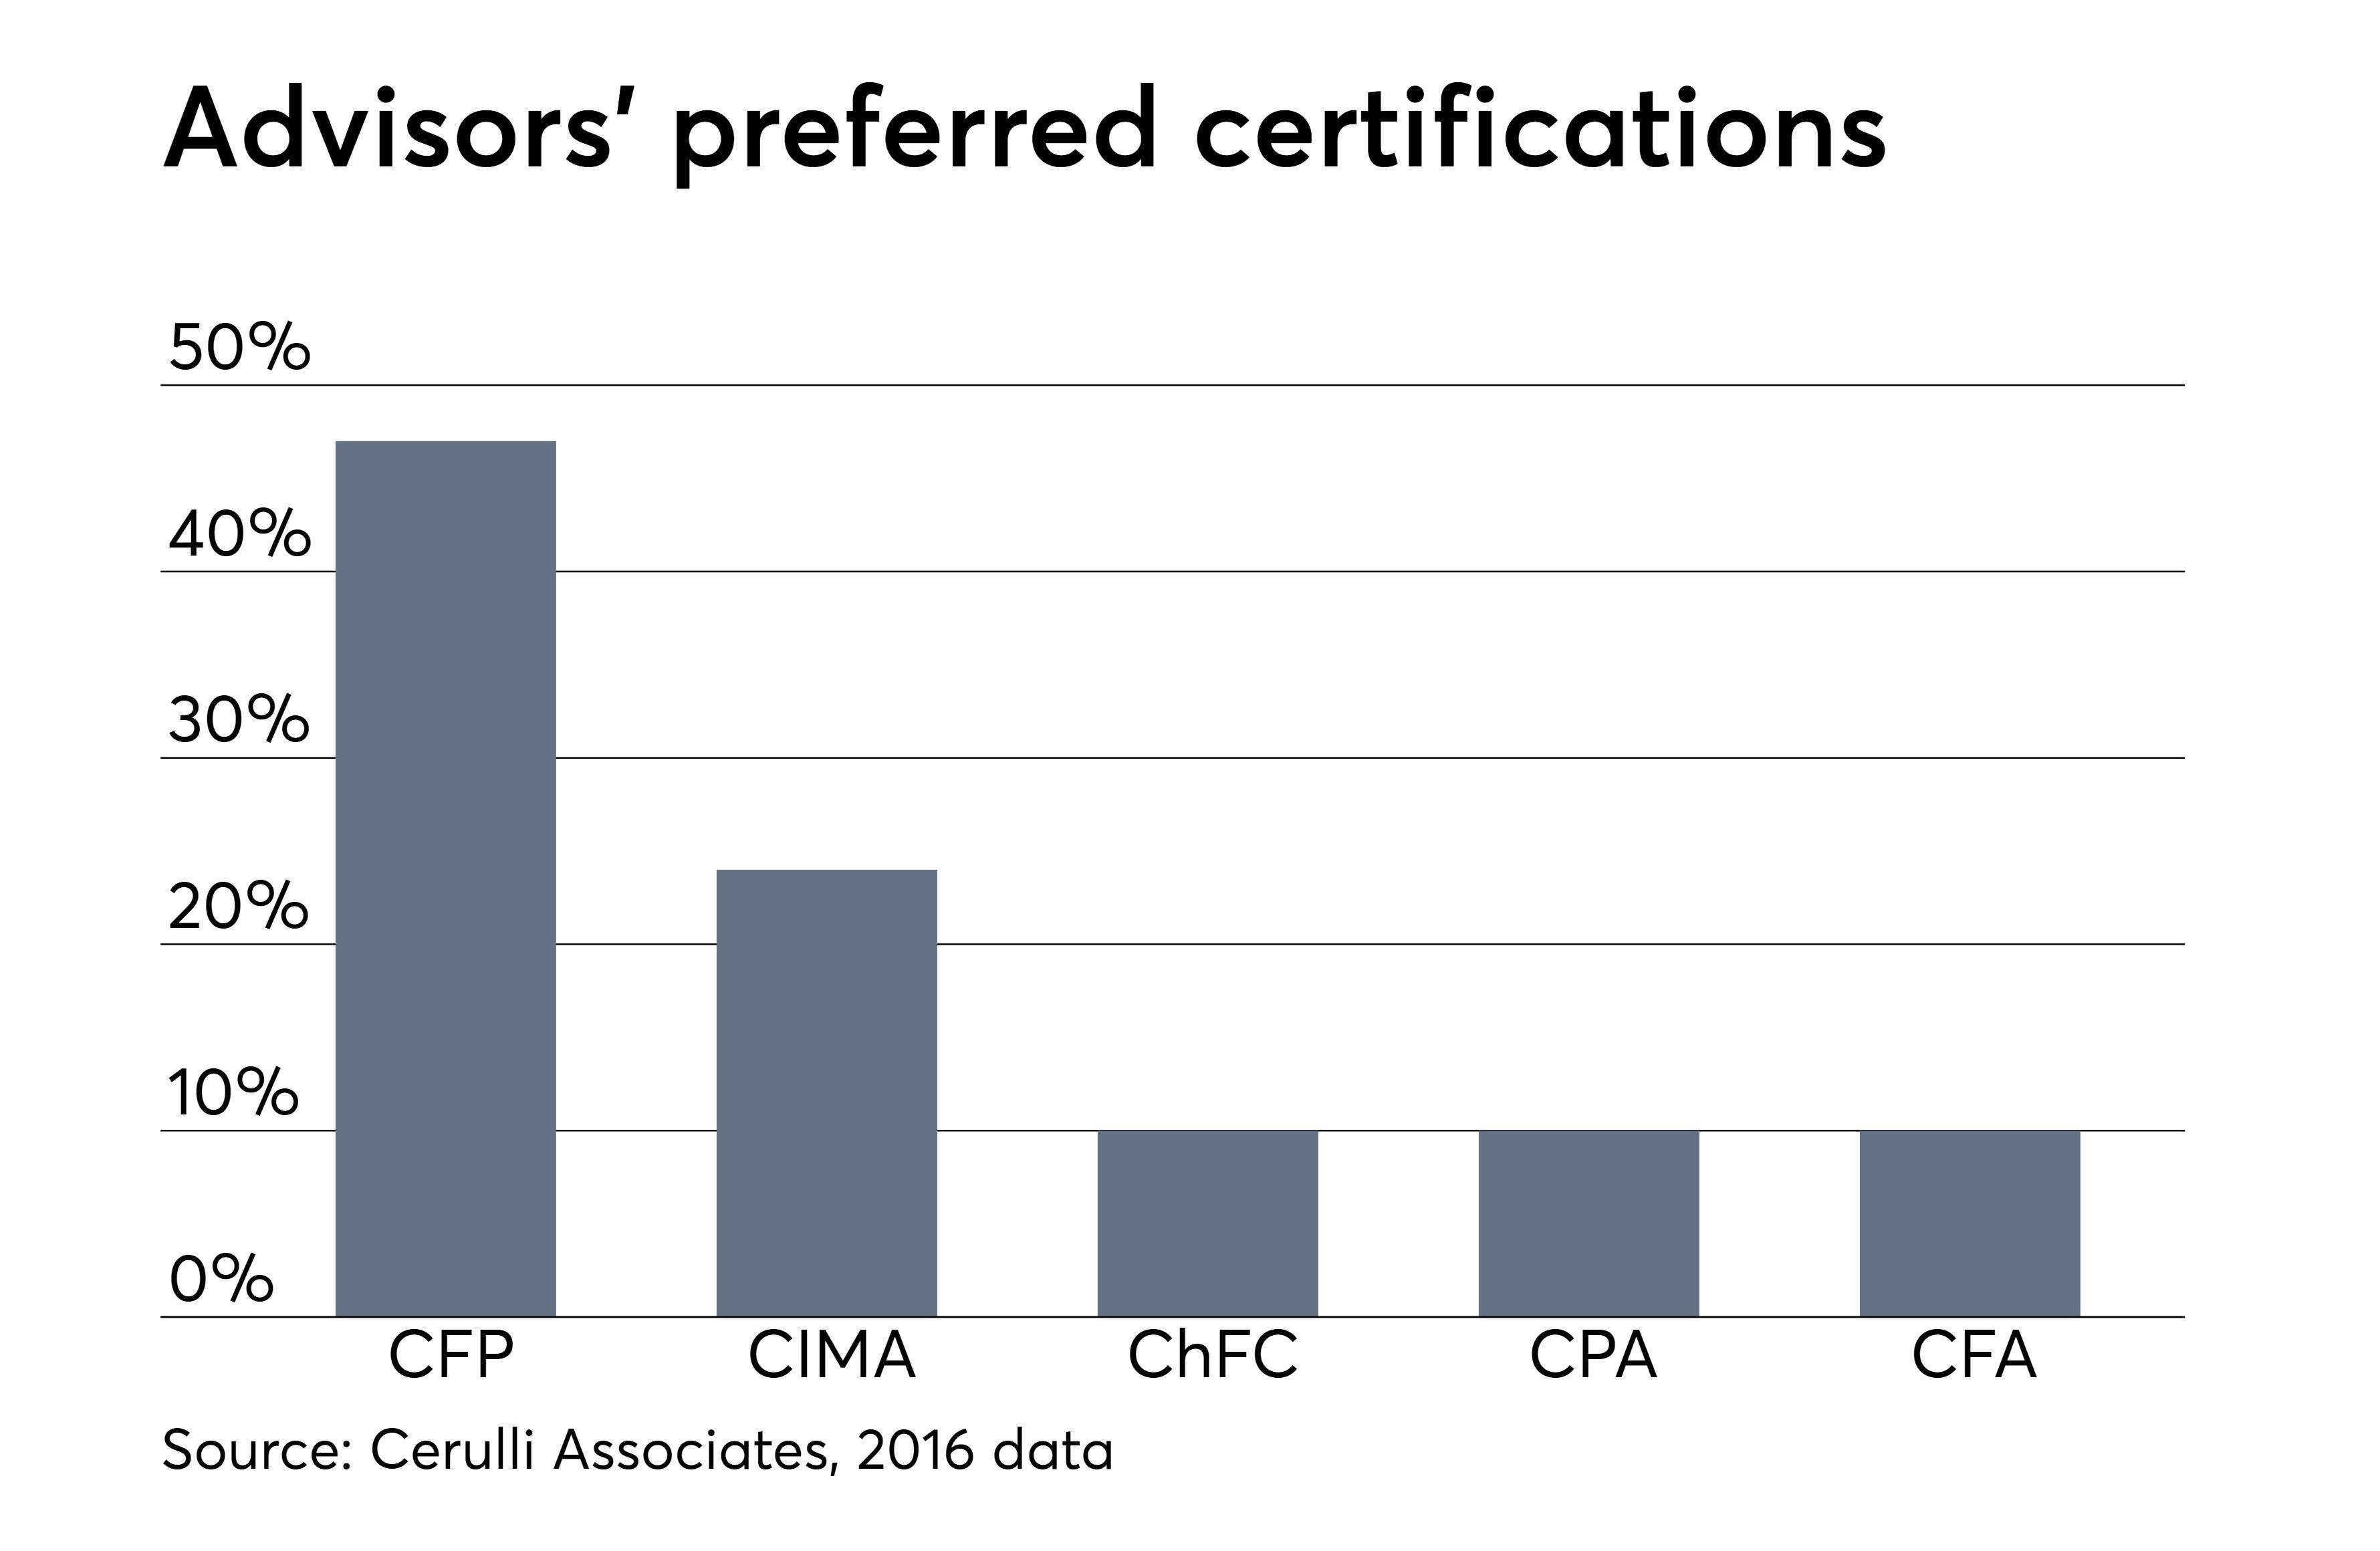 https://assets.sourcemedia.com/bd/55/da5ebe48477ba84d6082ce3743ec/advisors-favorite-certifications-and-designations.jpeg